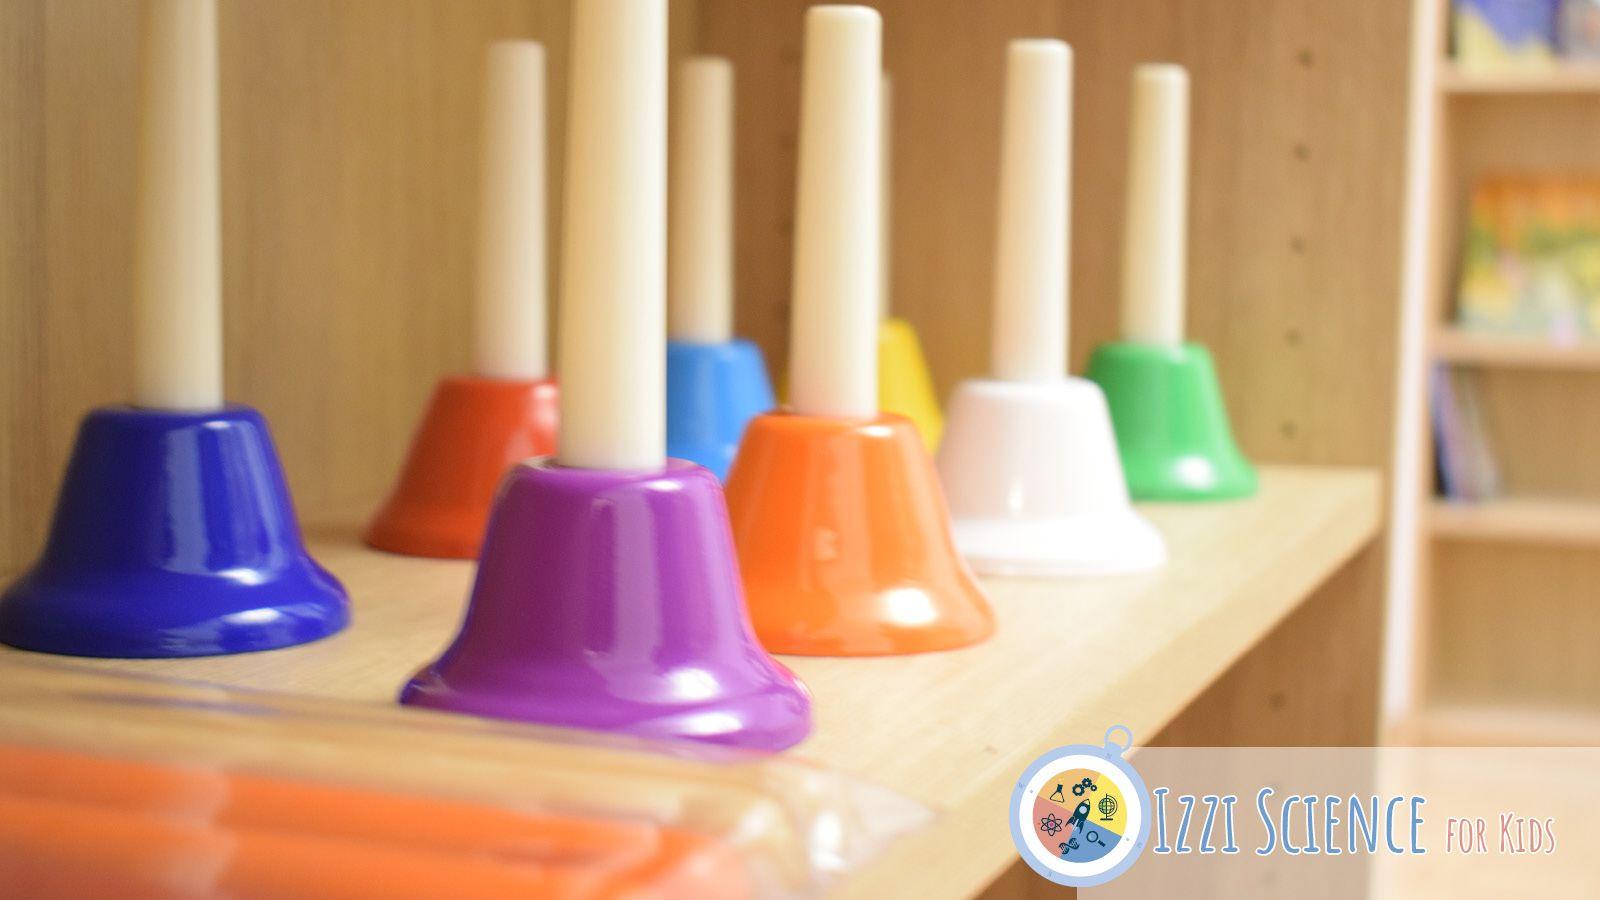 Частно начално училище Izzi Science for Kids кабинет по музика